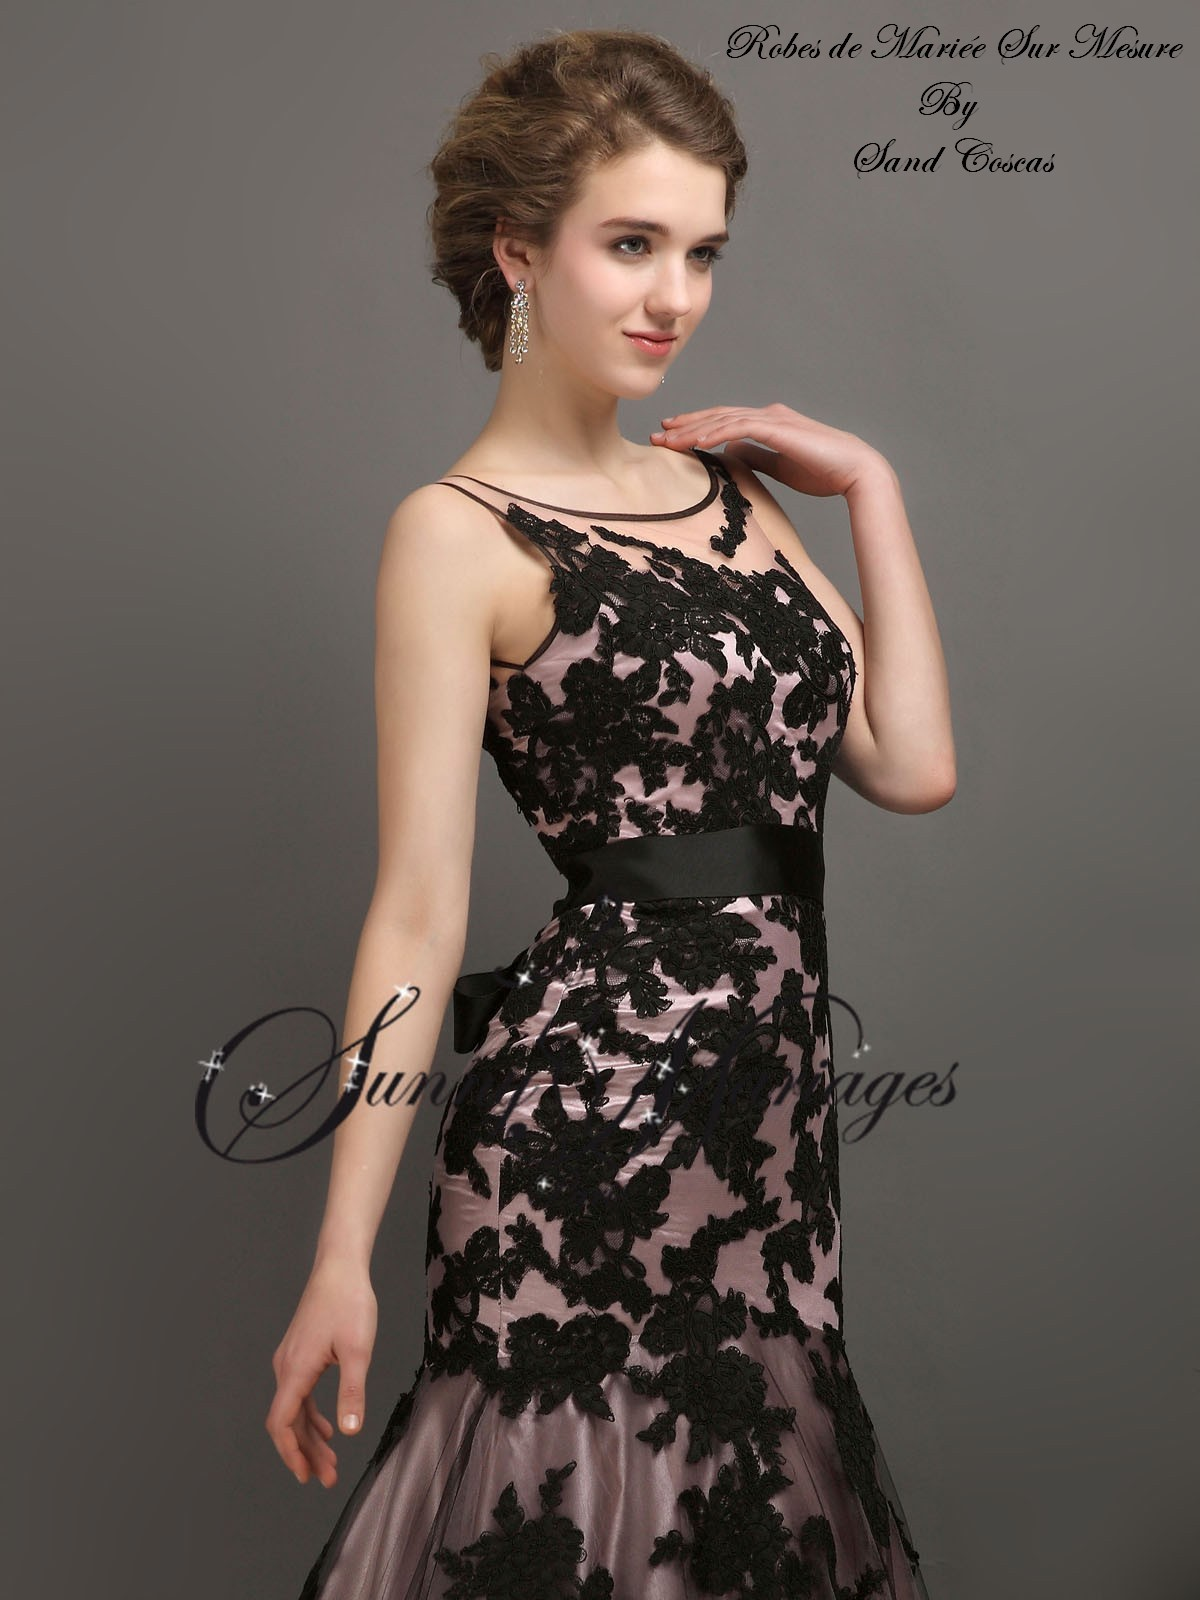 robe de mari e couleur dentelle noire coupe sirene sunny mariage. Black Bedroom Furniture Sets. Home Design Ideas